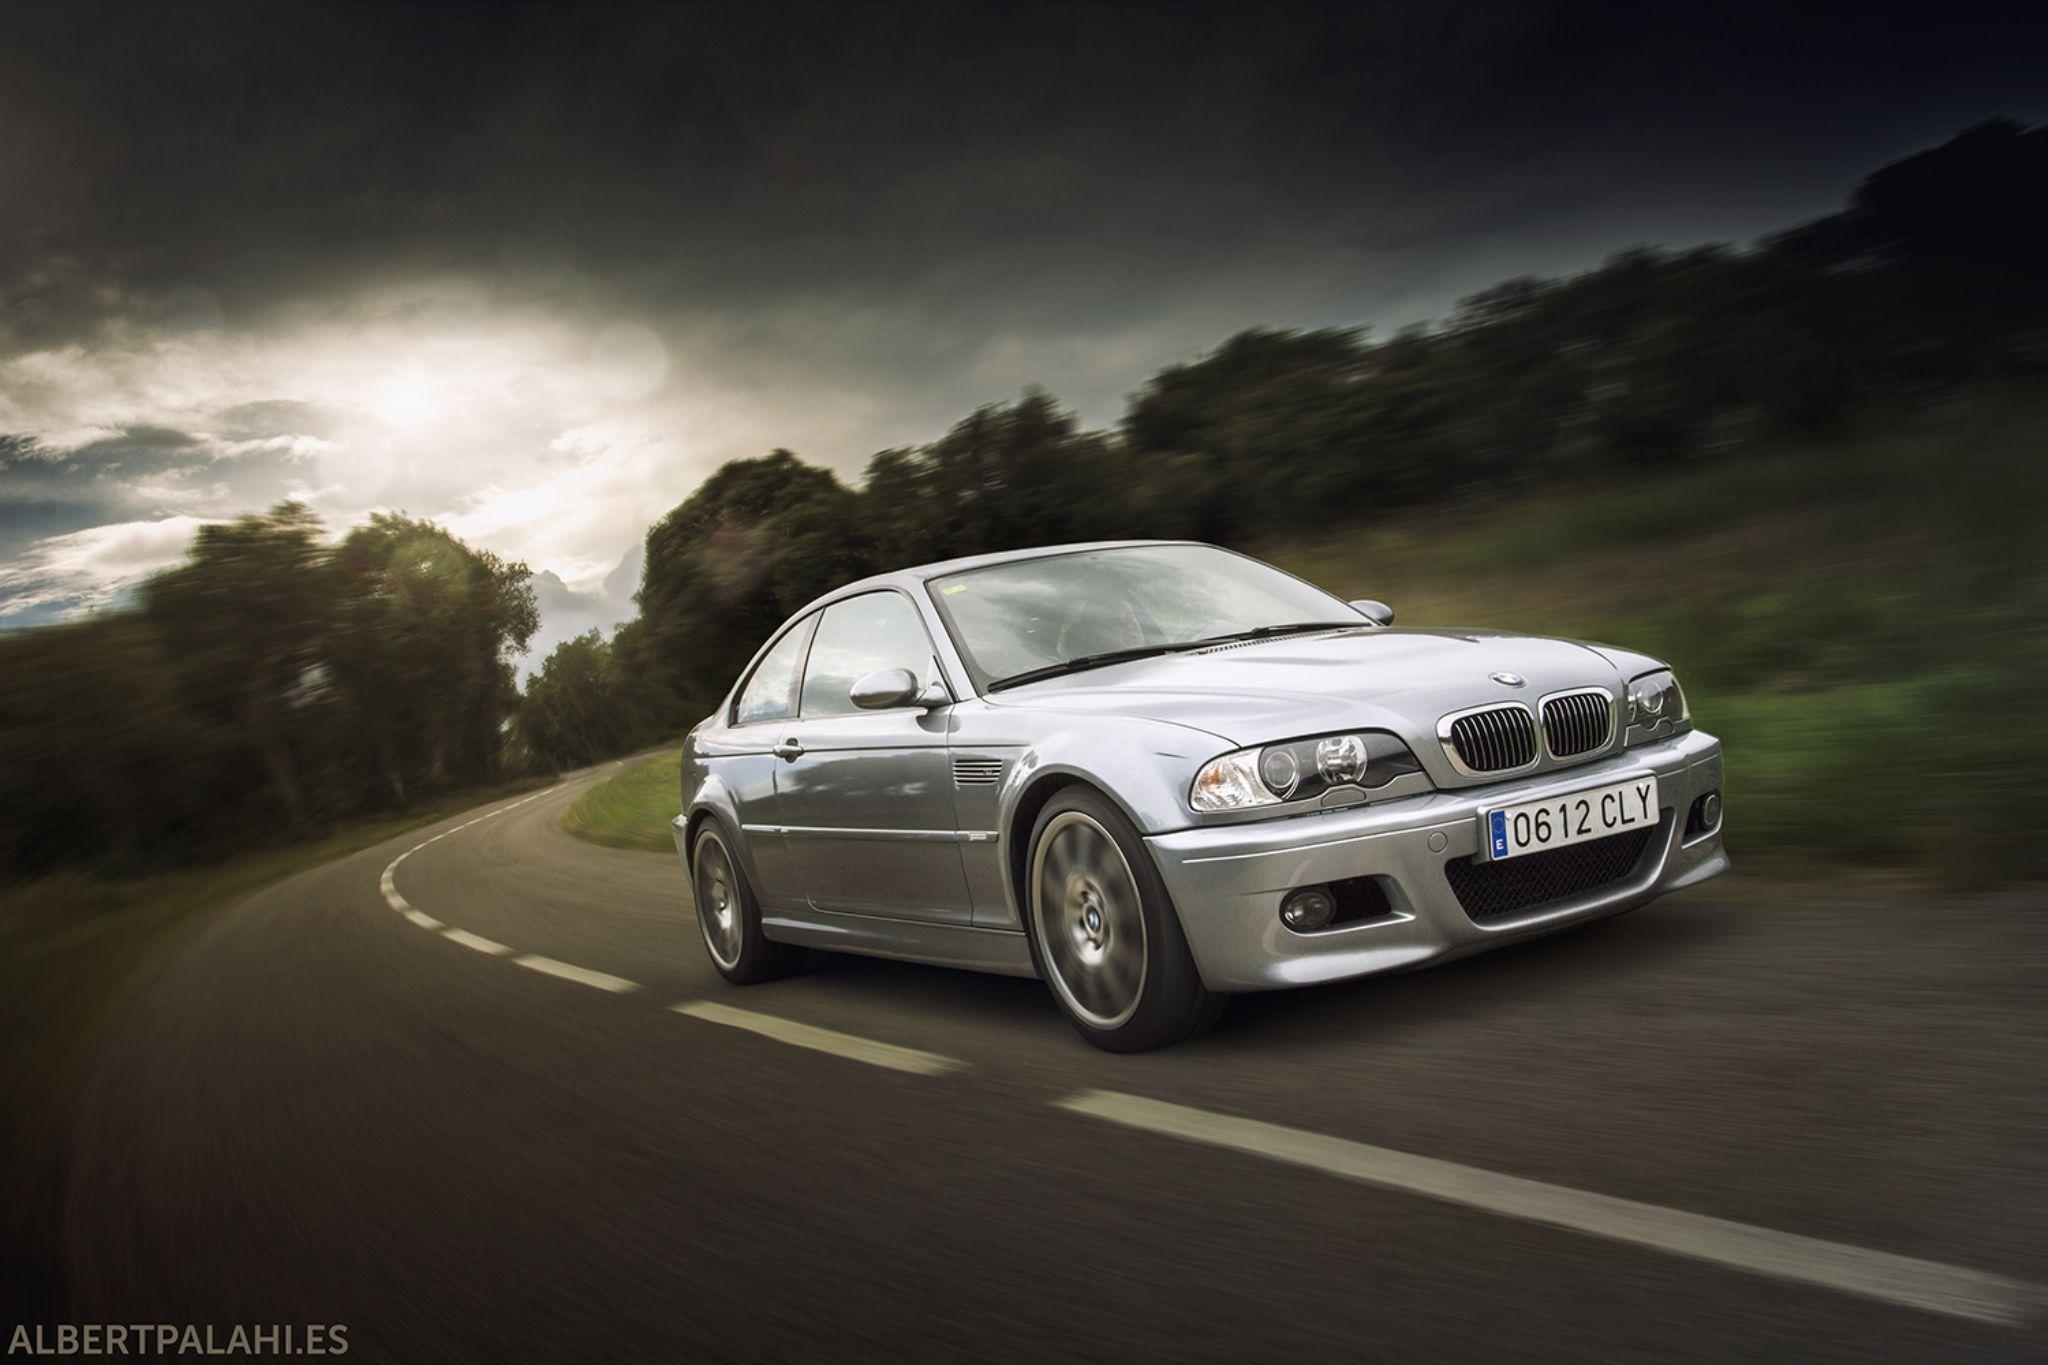 BMW M3 E46 by albertpalahi